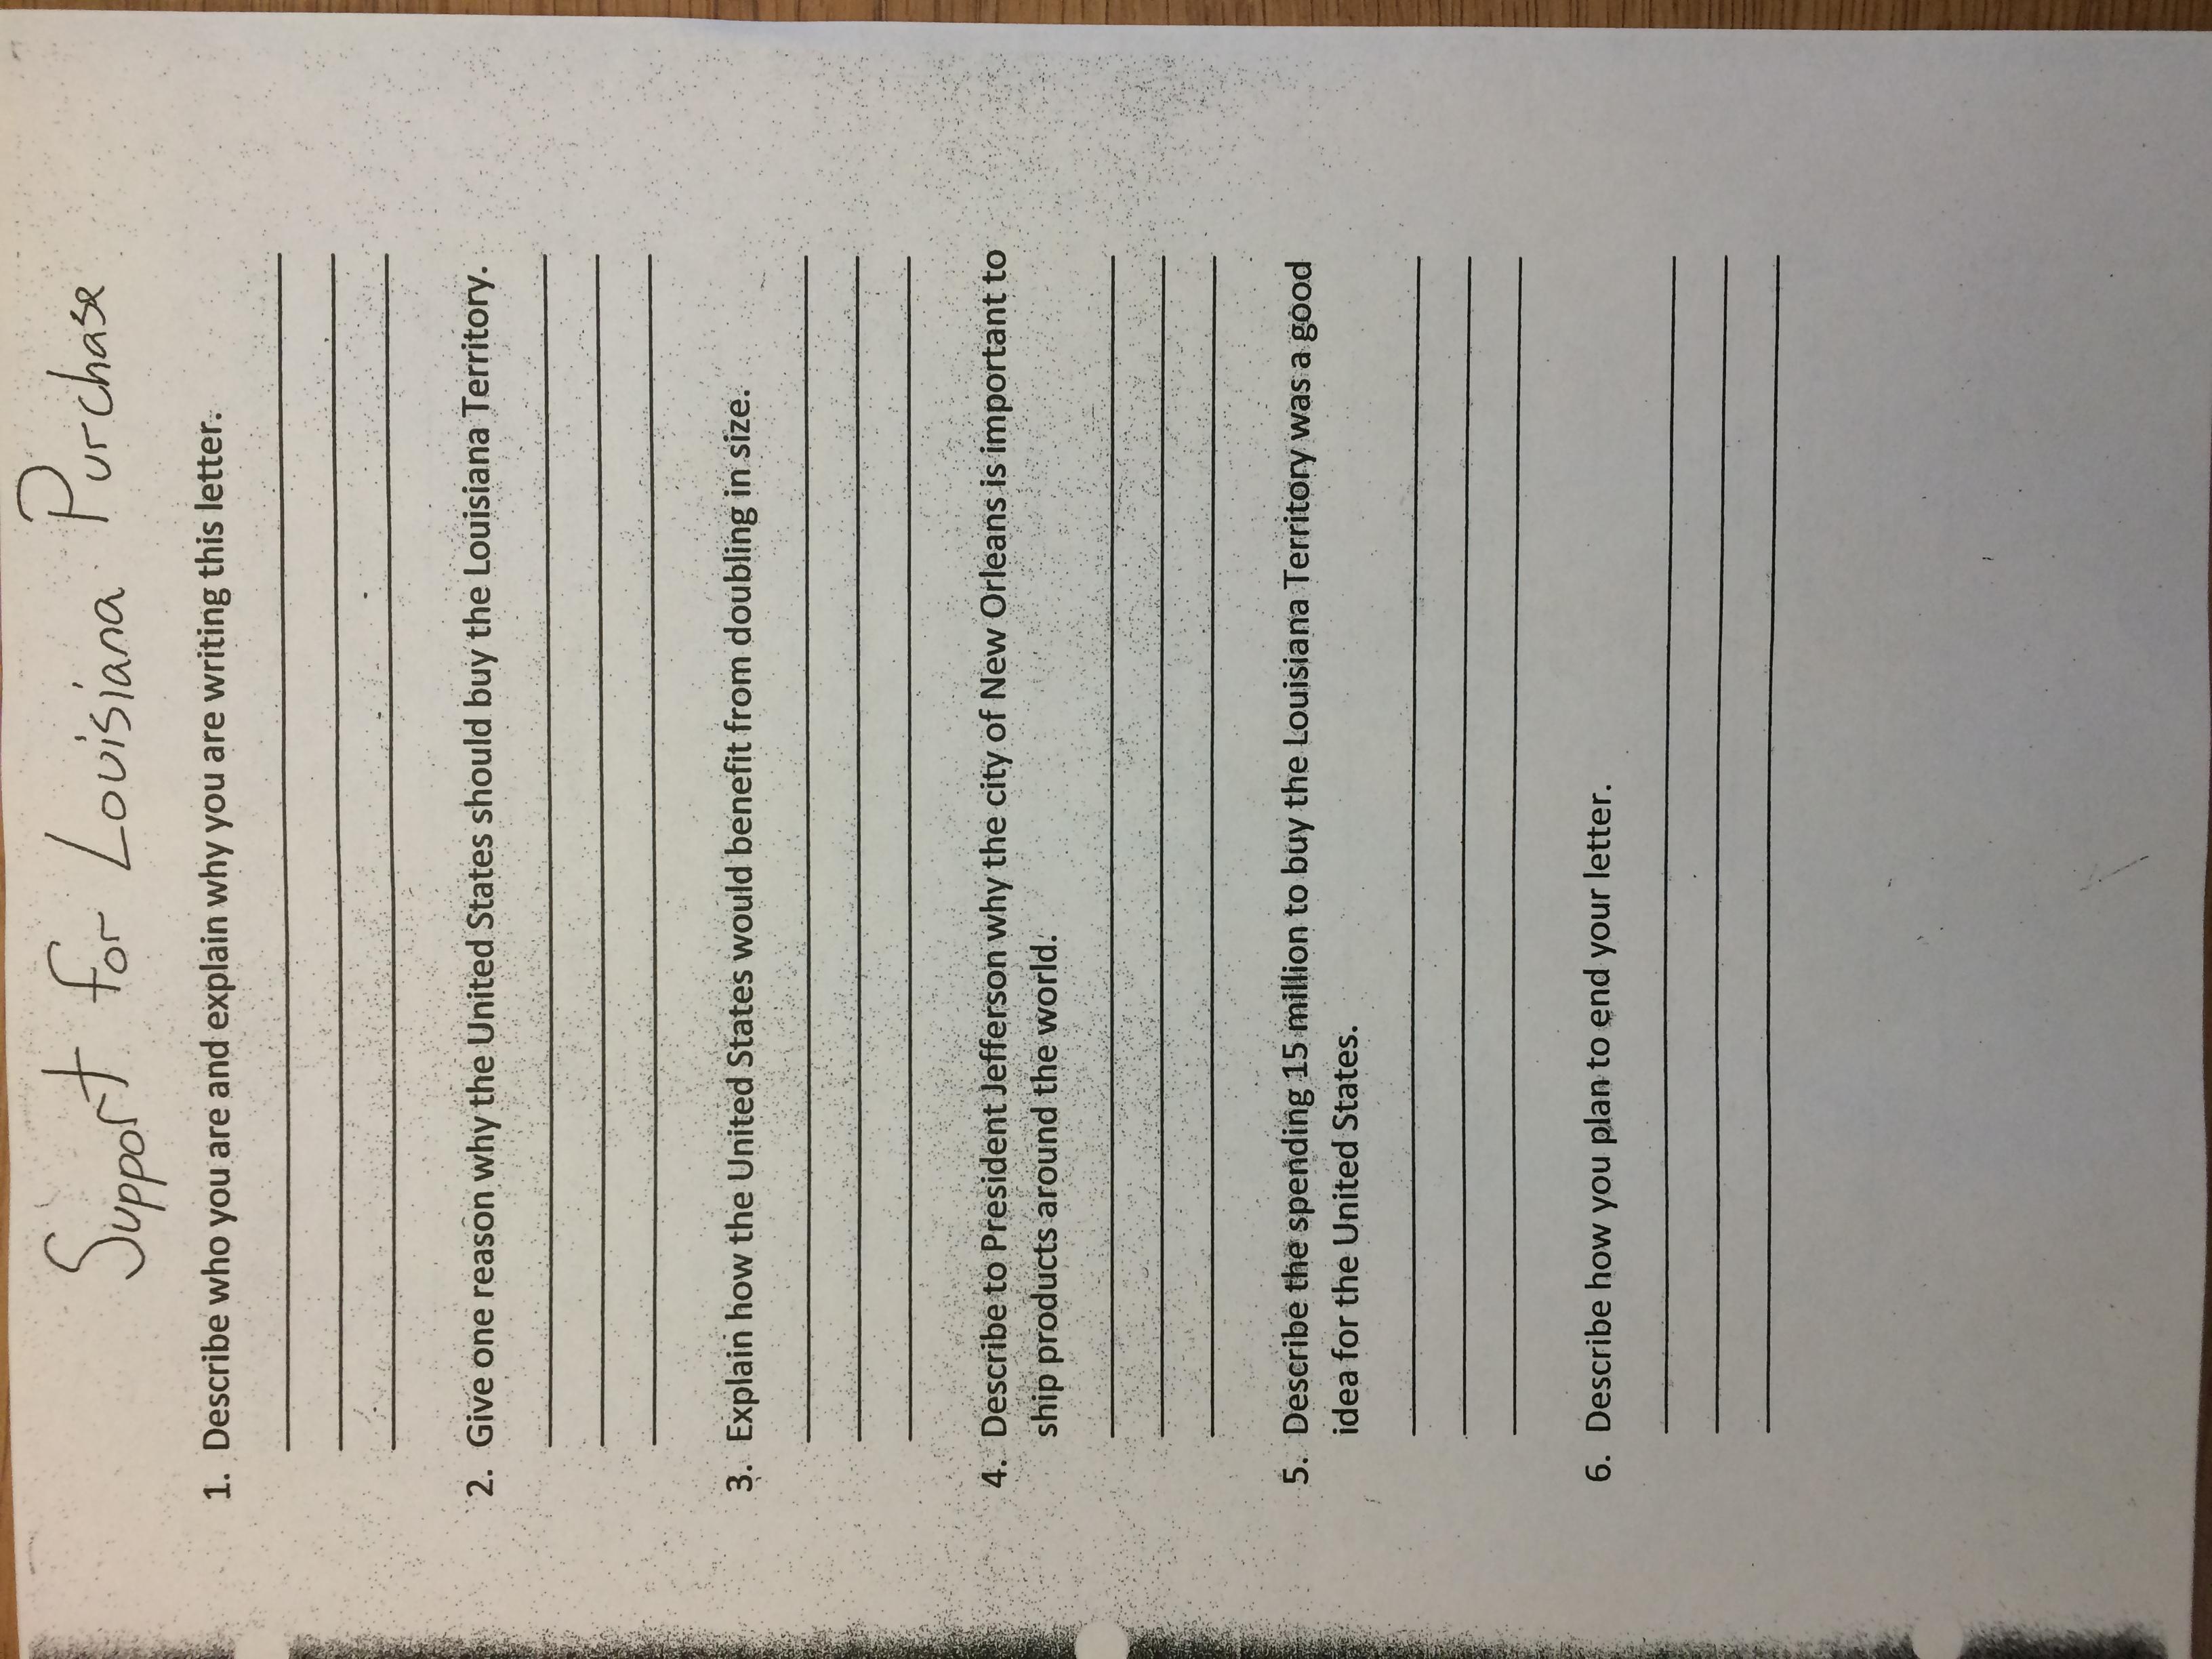 Write a report on max schneider gibberish played backwards